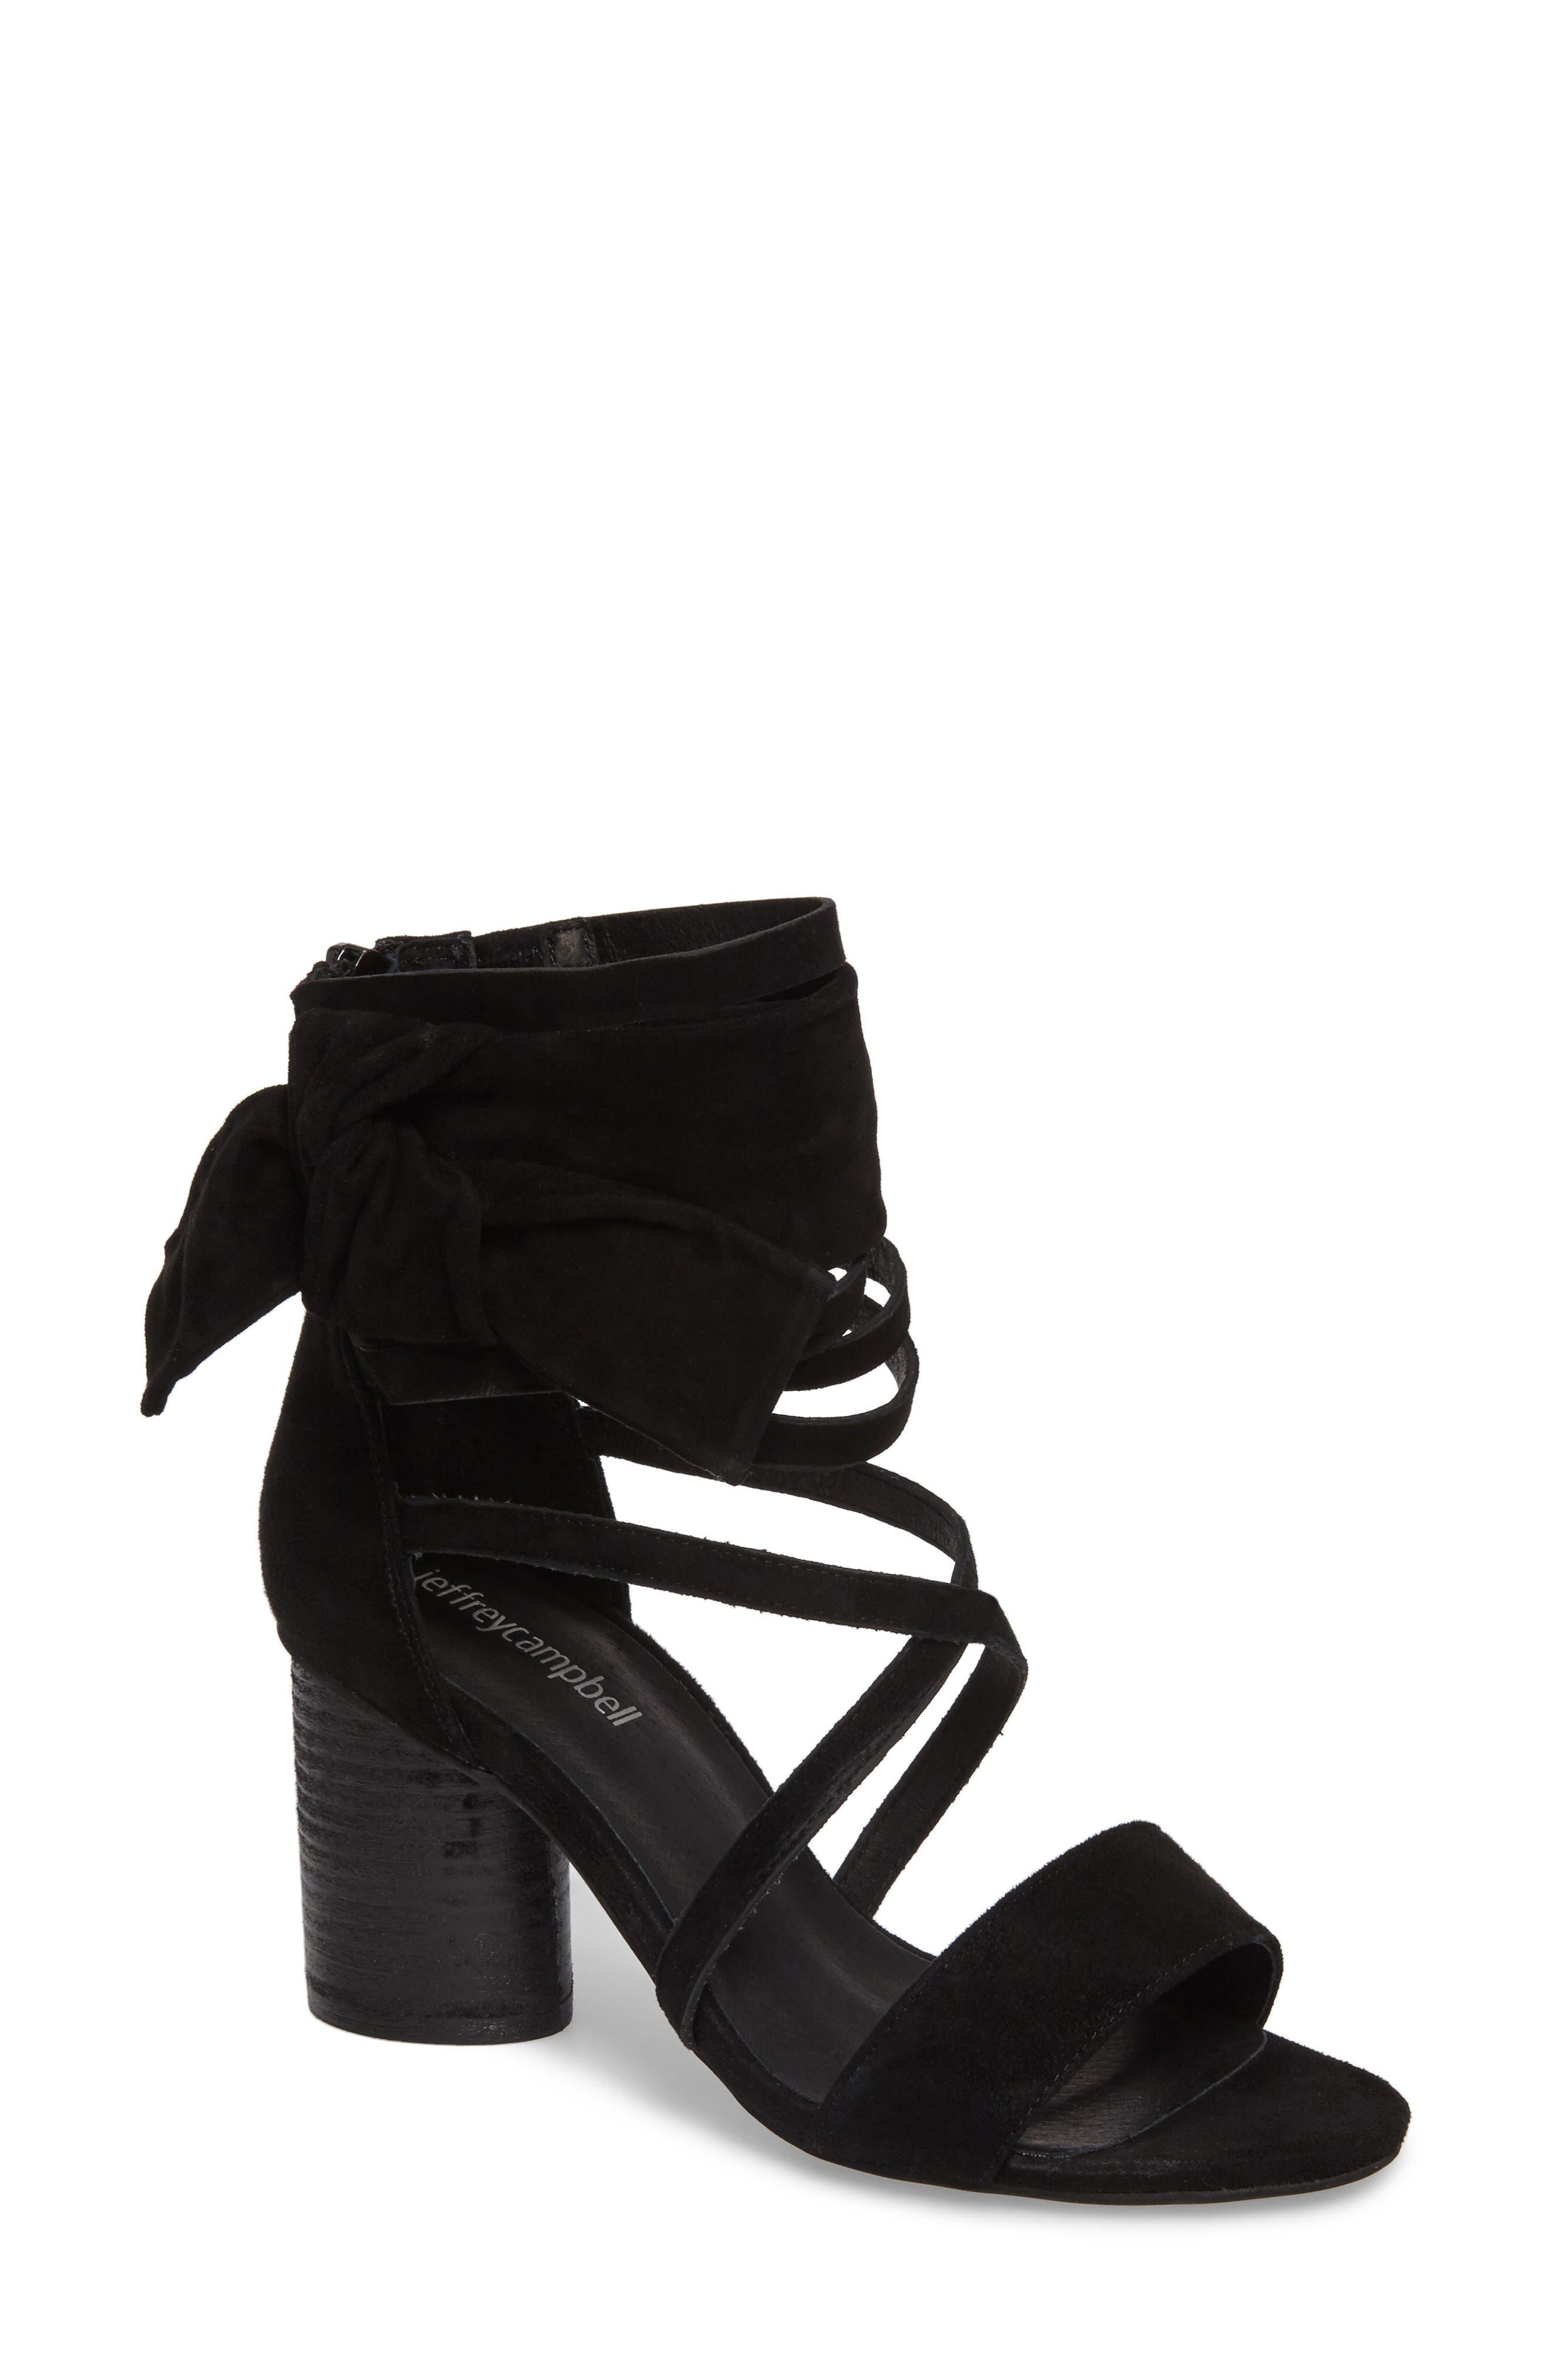 Main Image - Jeffrey Campbell Destini Ankle Cuff Sandal (Women)